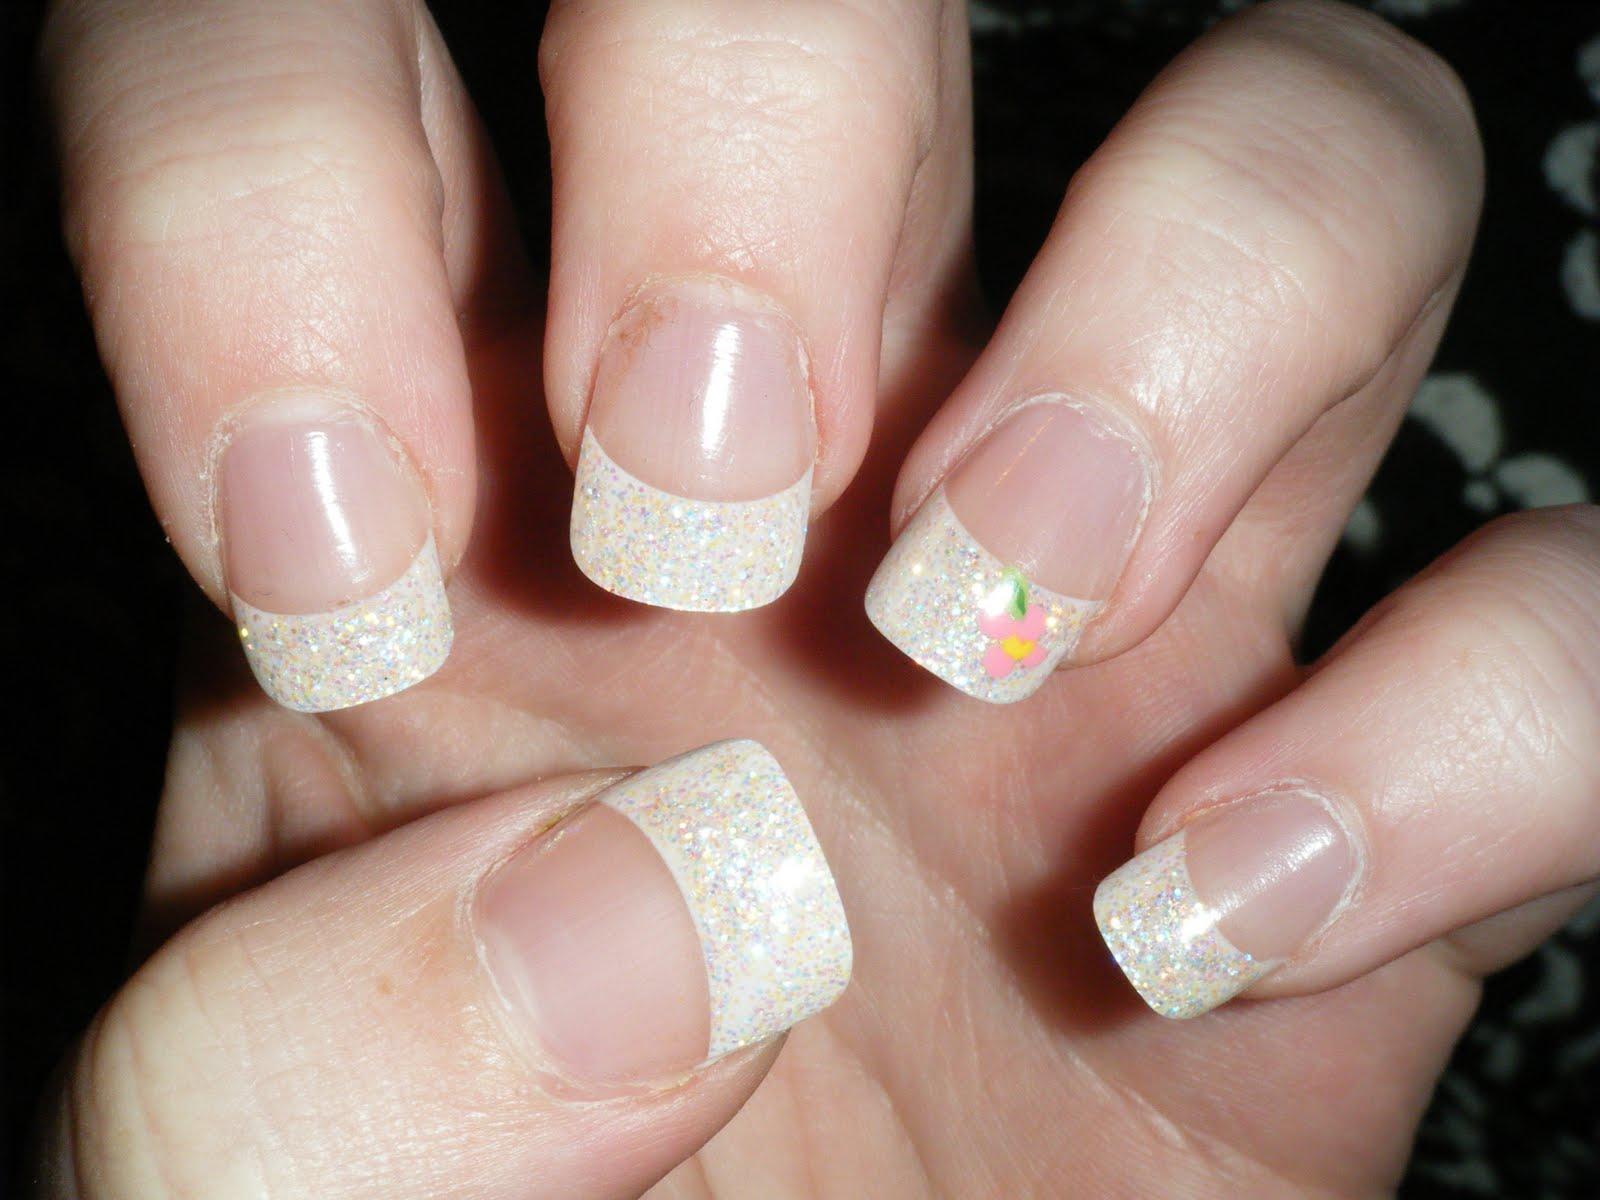 Nail designs 2017 white tip eye candy nails training white tips view images nail designs white tip prinsesfo Choice Image